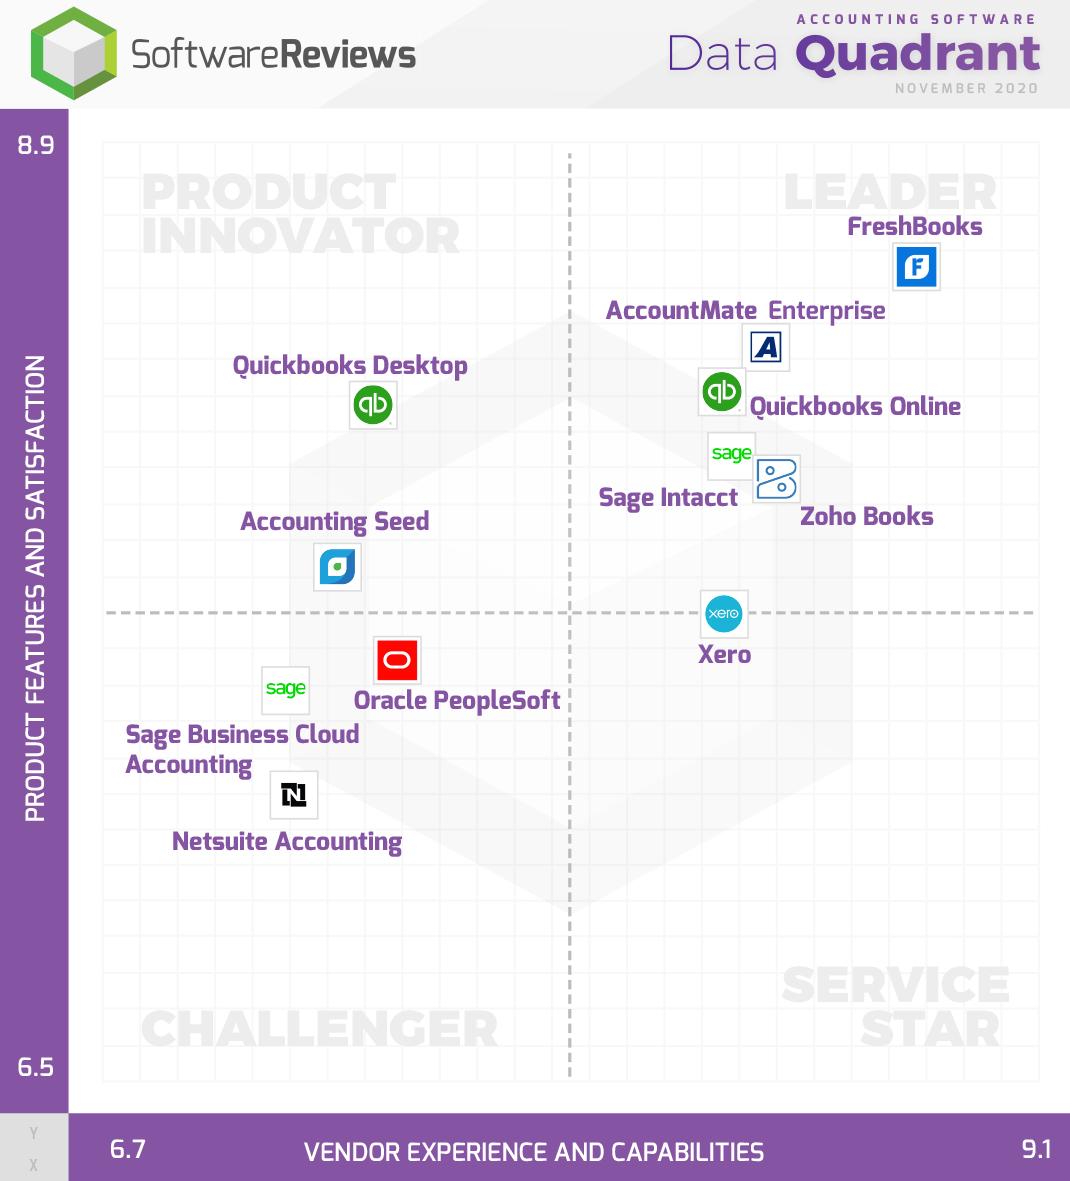 Accounting Software Data Quadrant